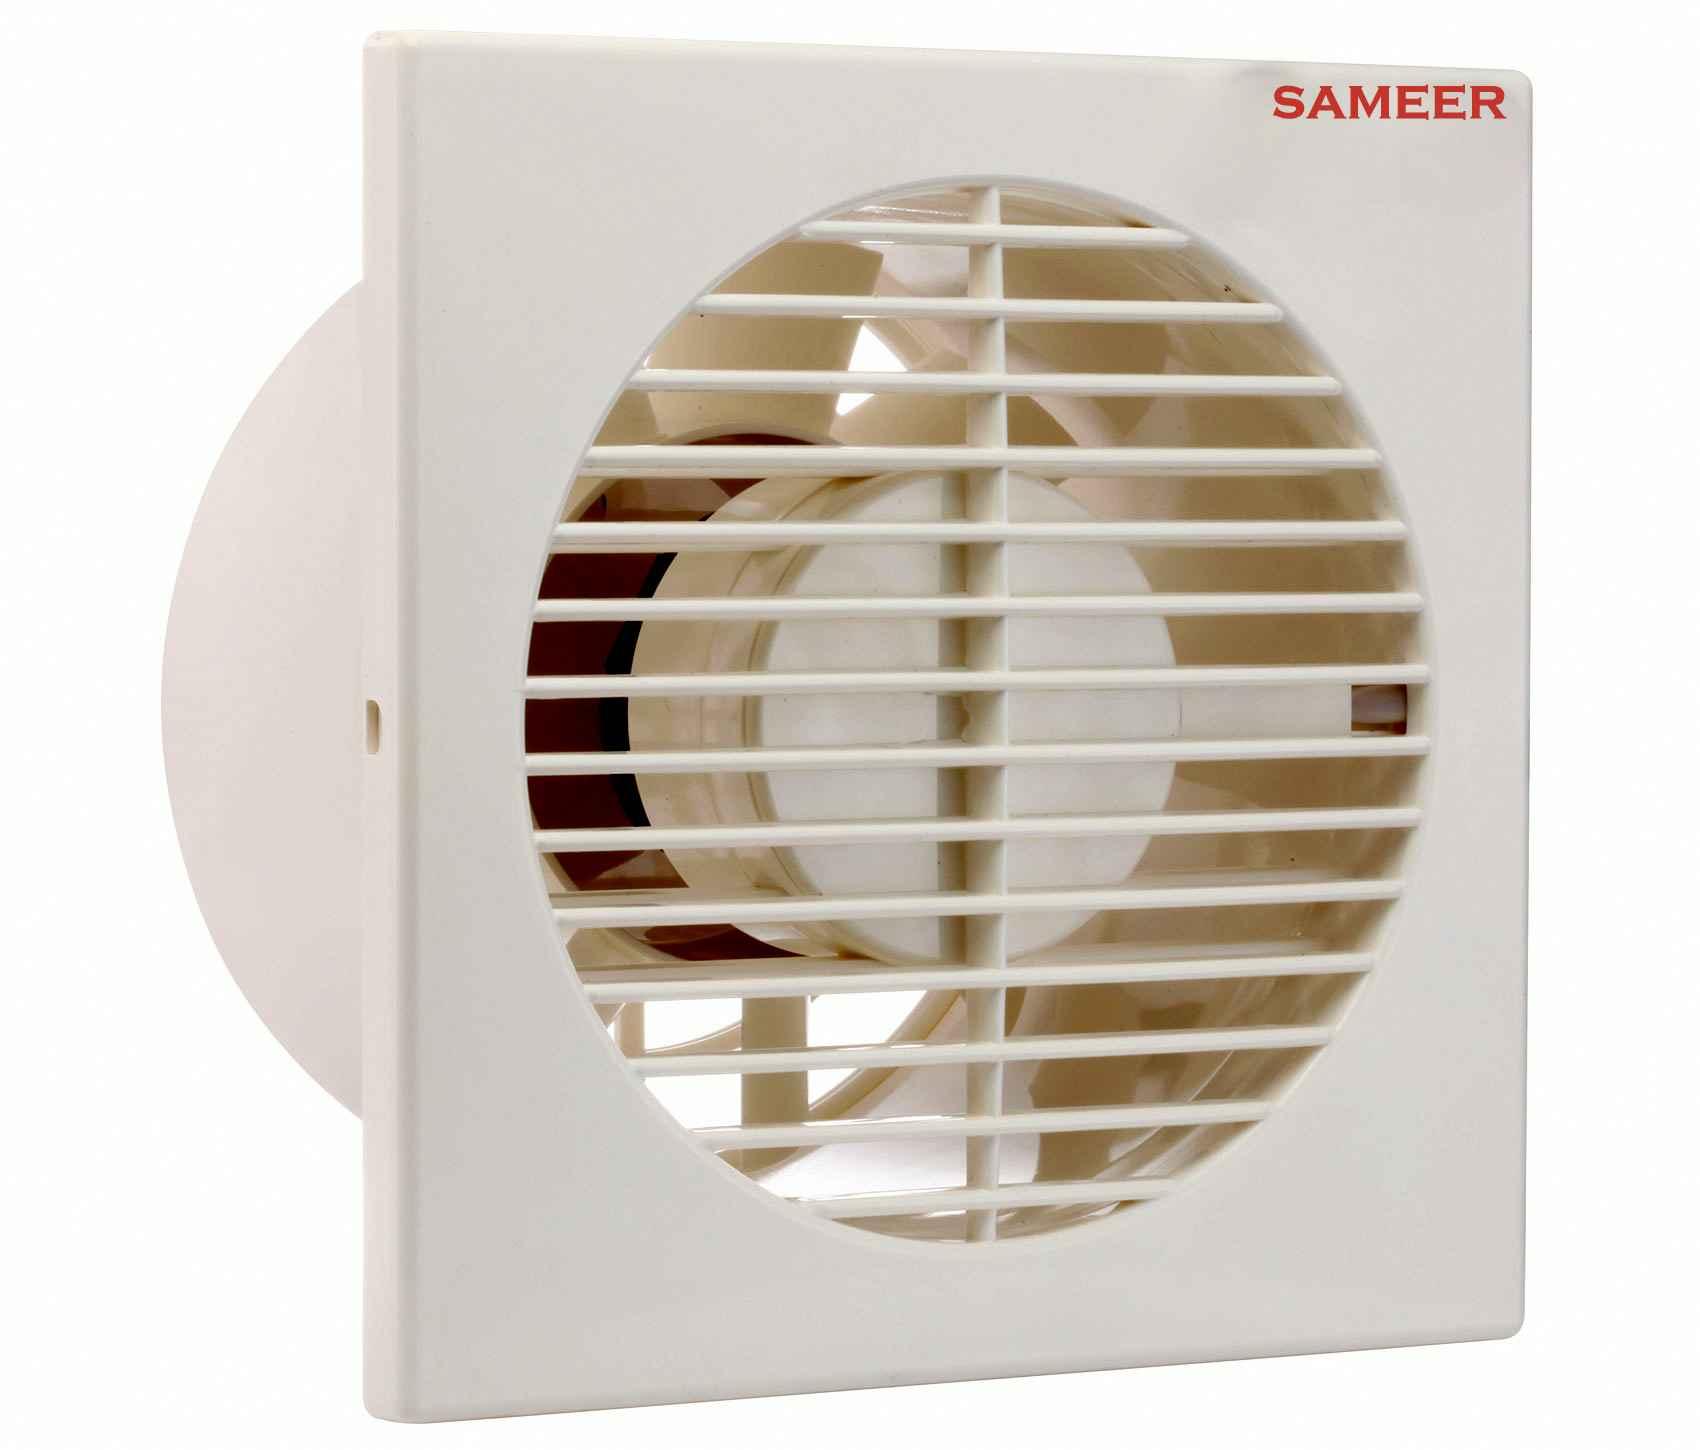 sameer smarty 4 inch exhaust ventilation fan speed 2200 rpm